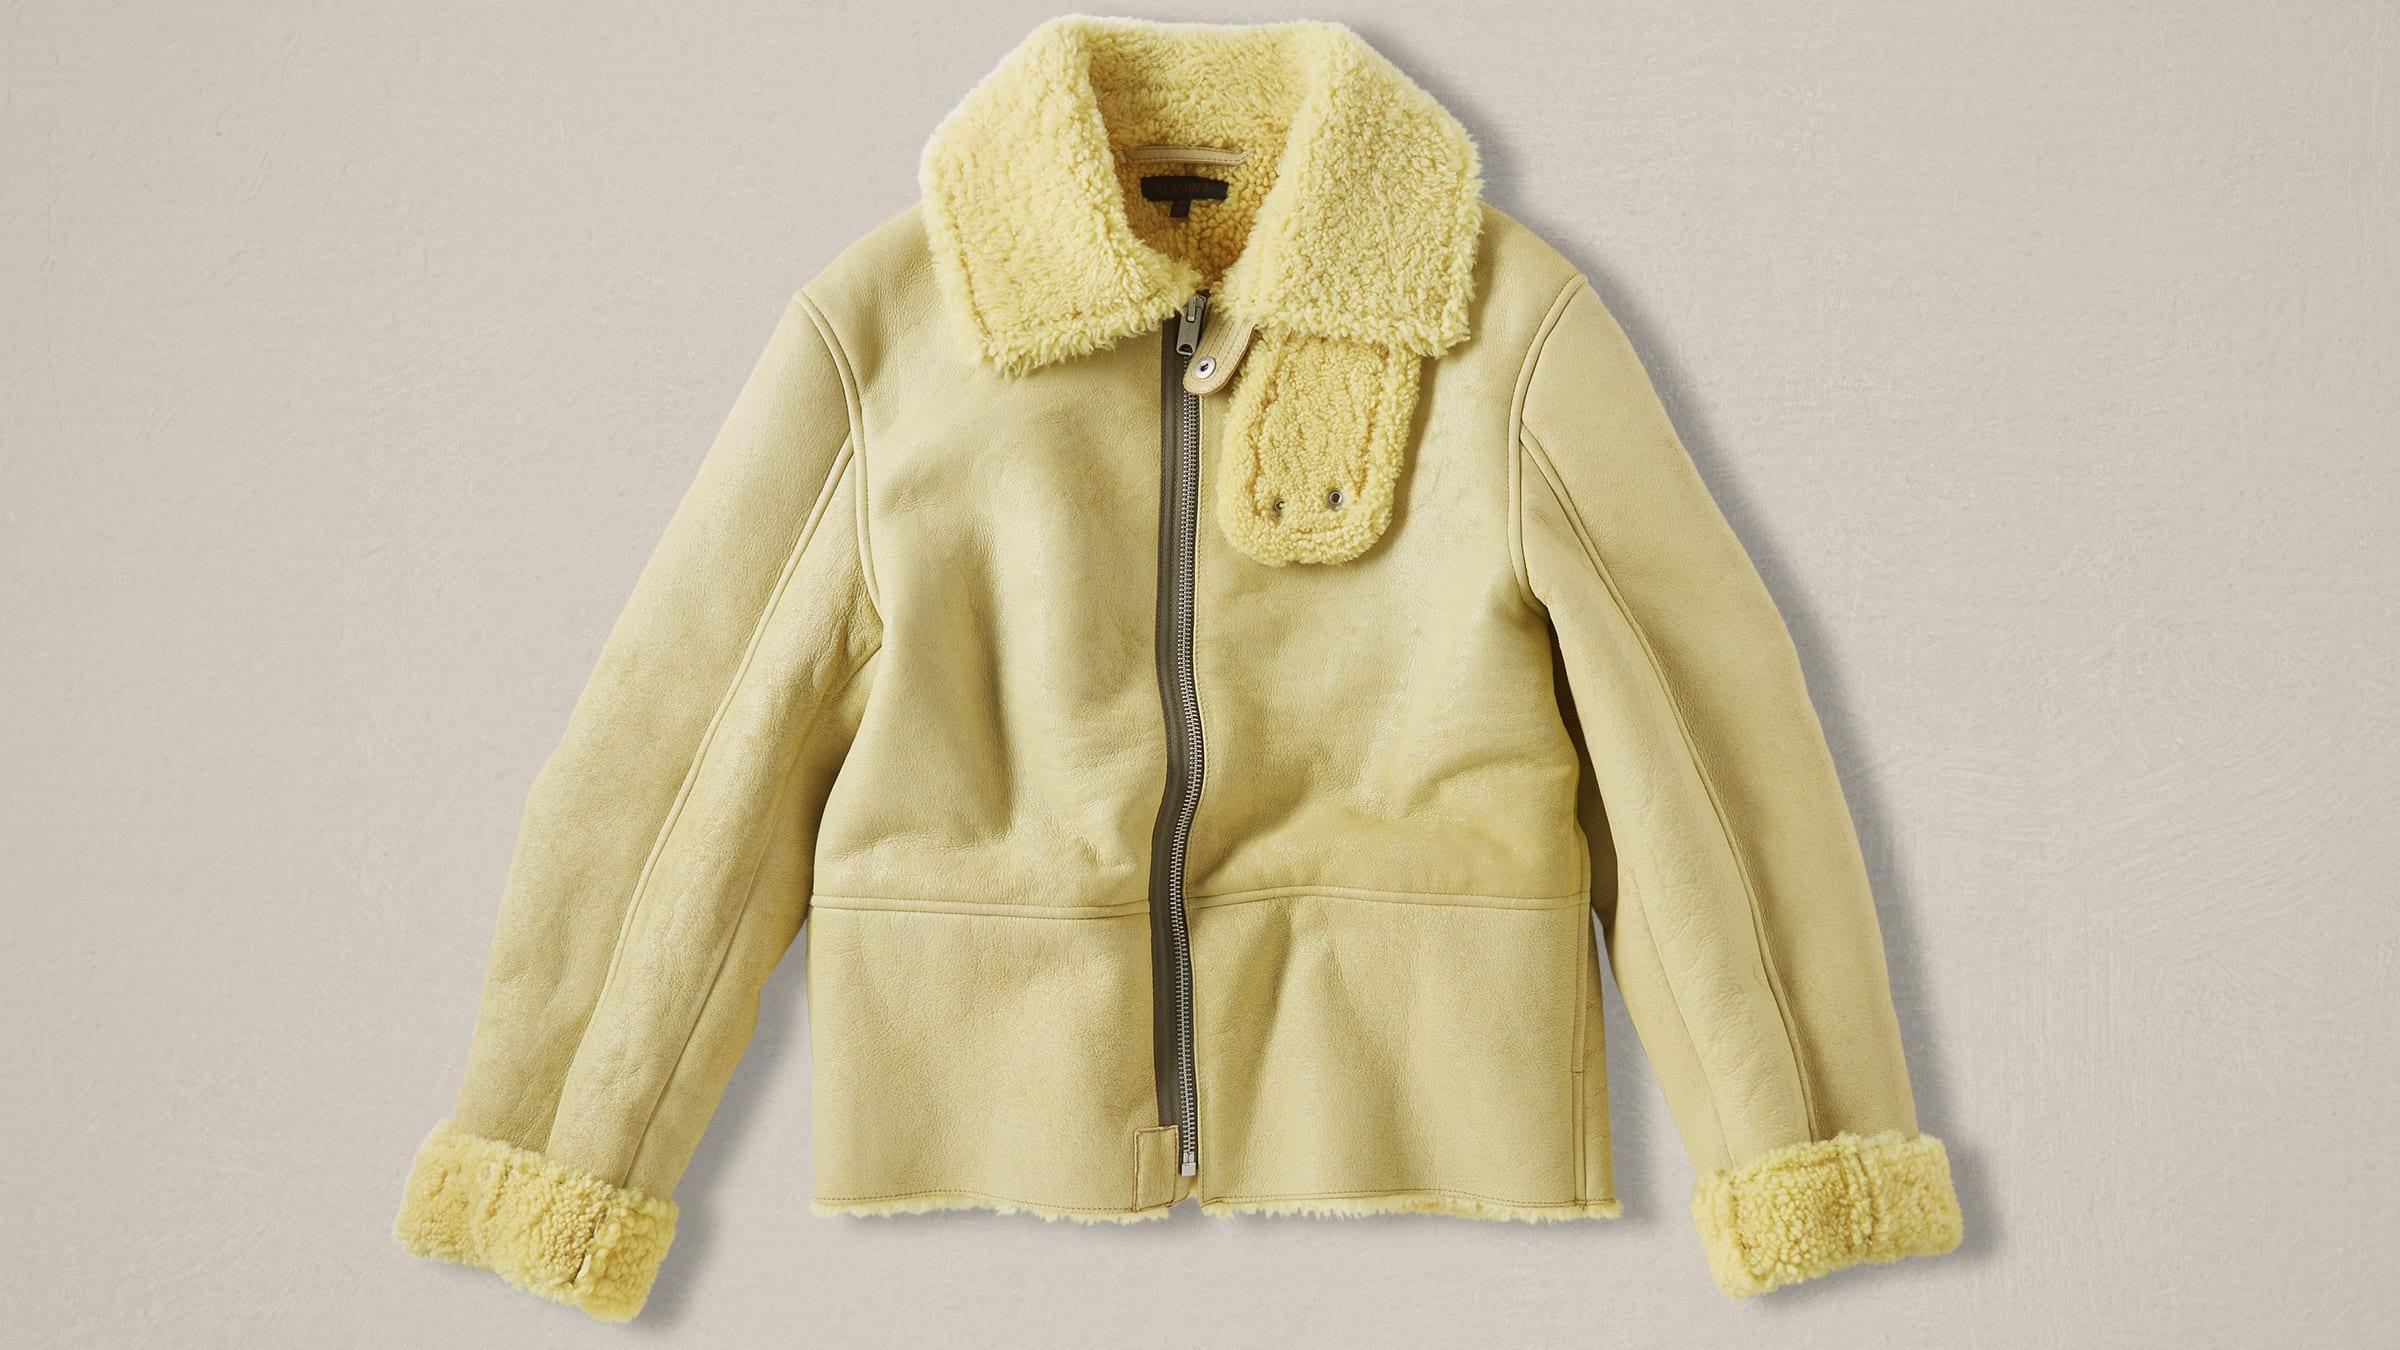 41d2043558dc4 Yeezy Season 3 Shearling Flight Jacket God Sun